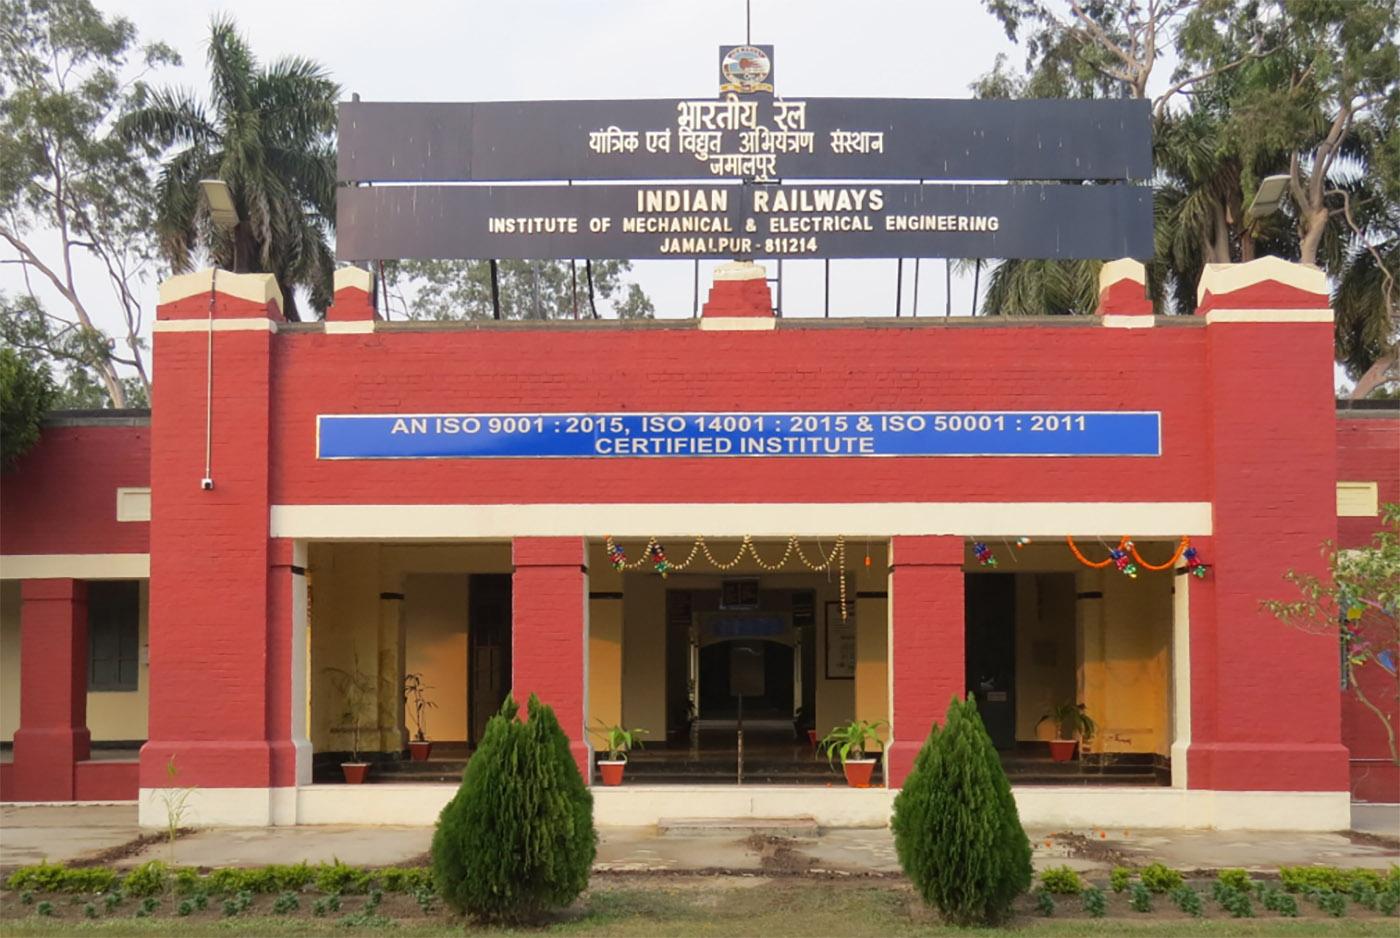 No plans to shift IRIMEE from Jamalpur